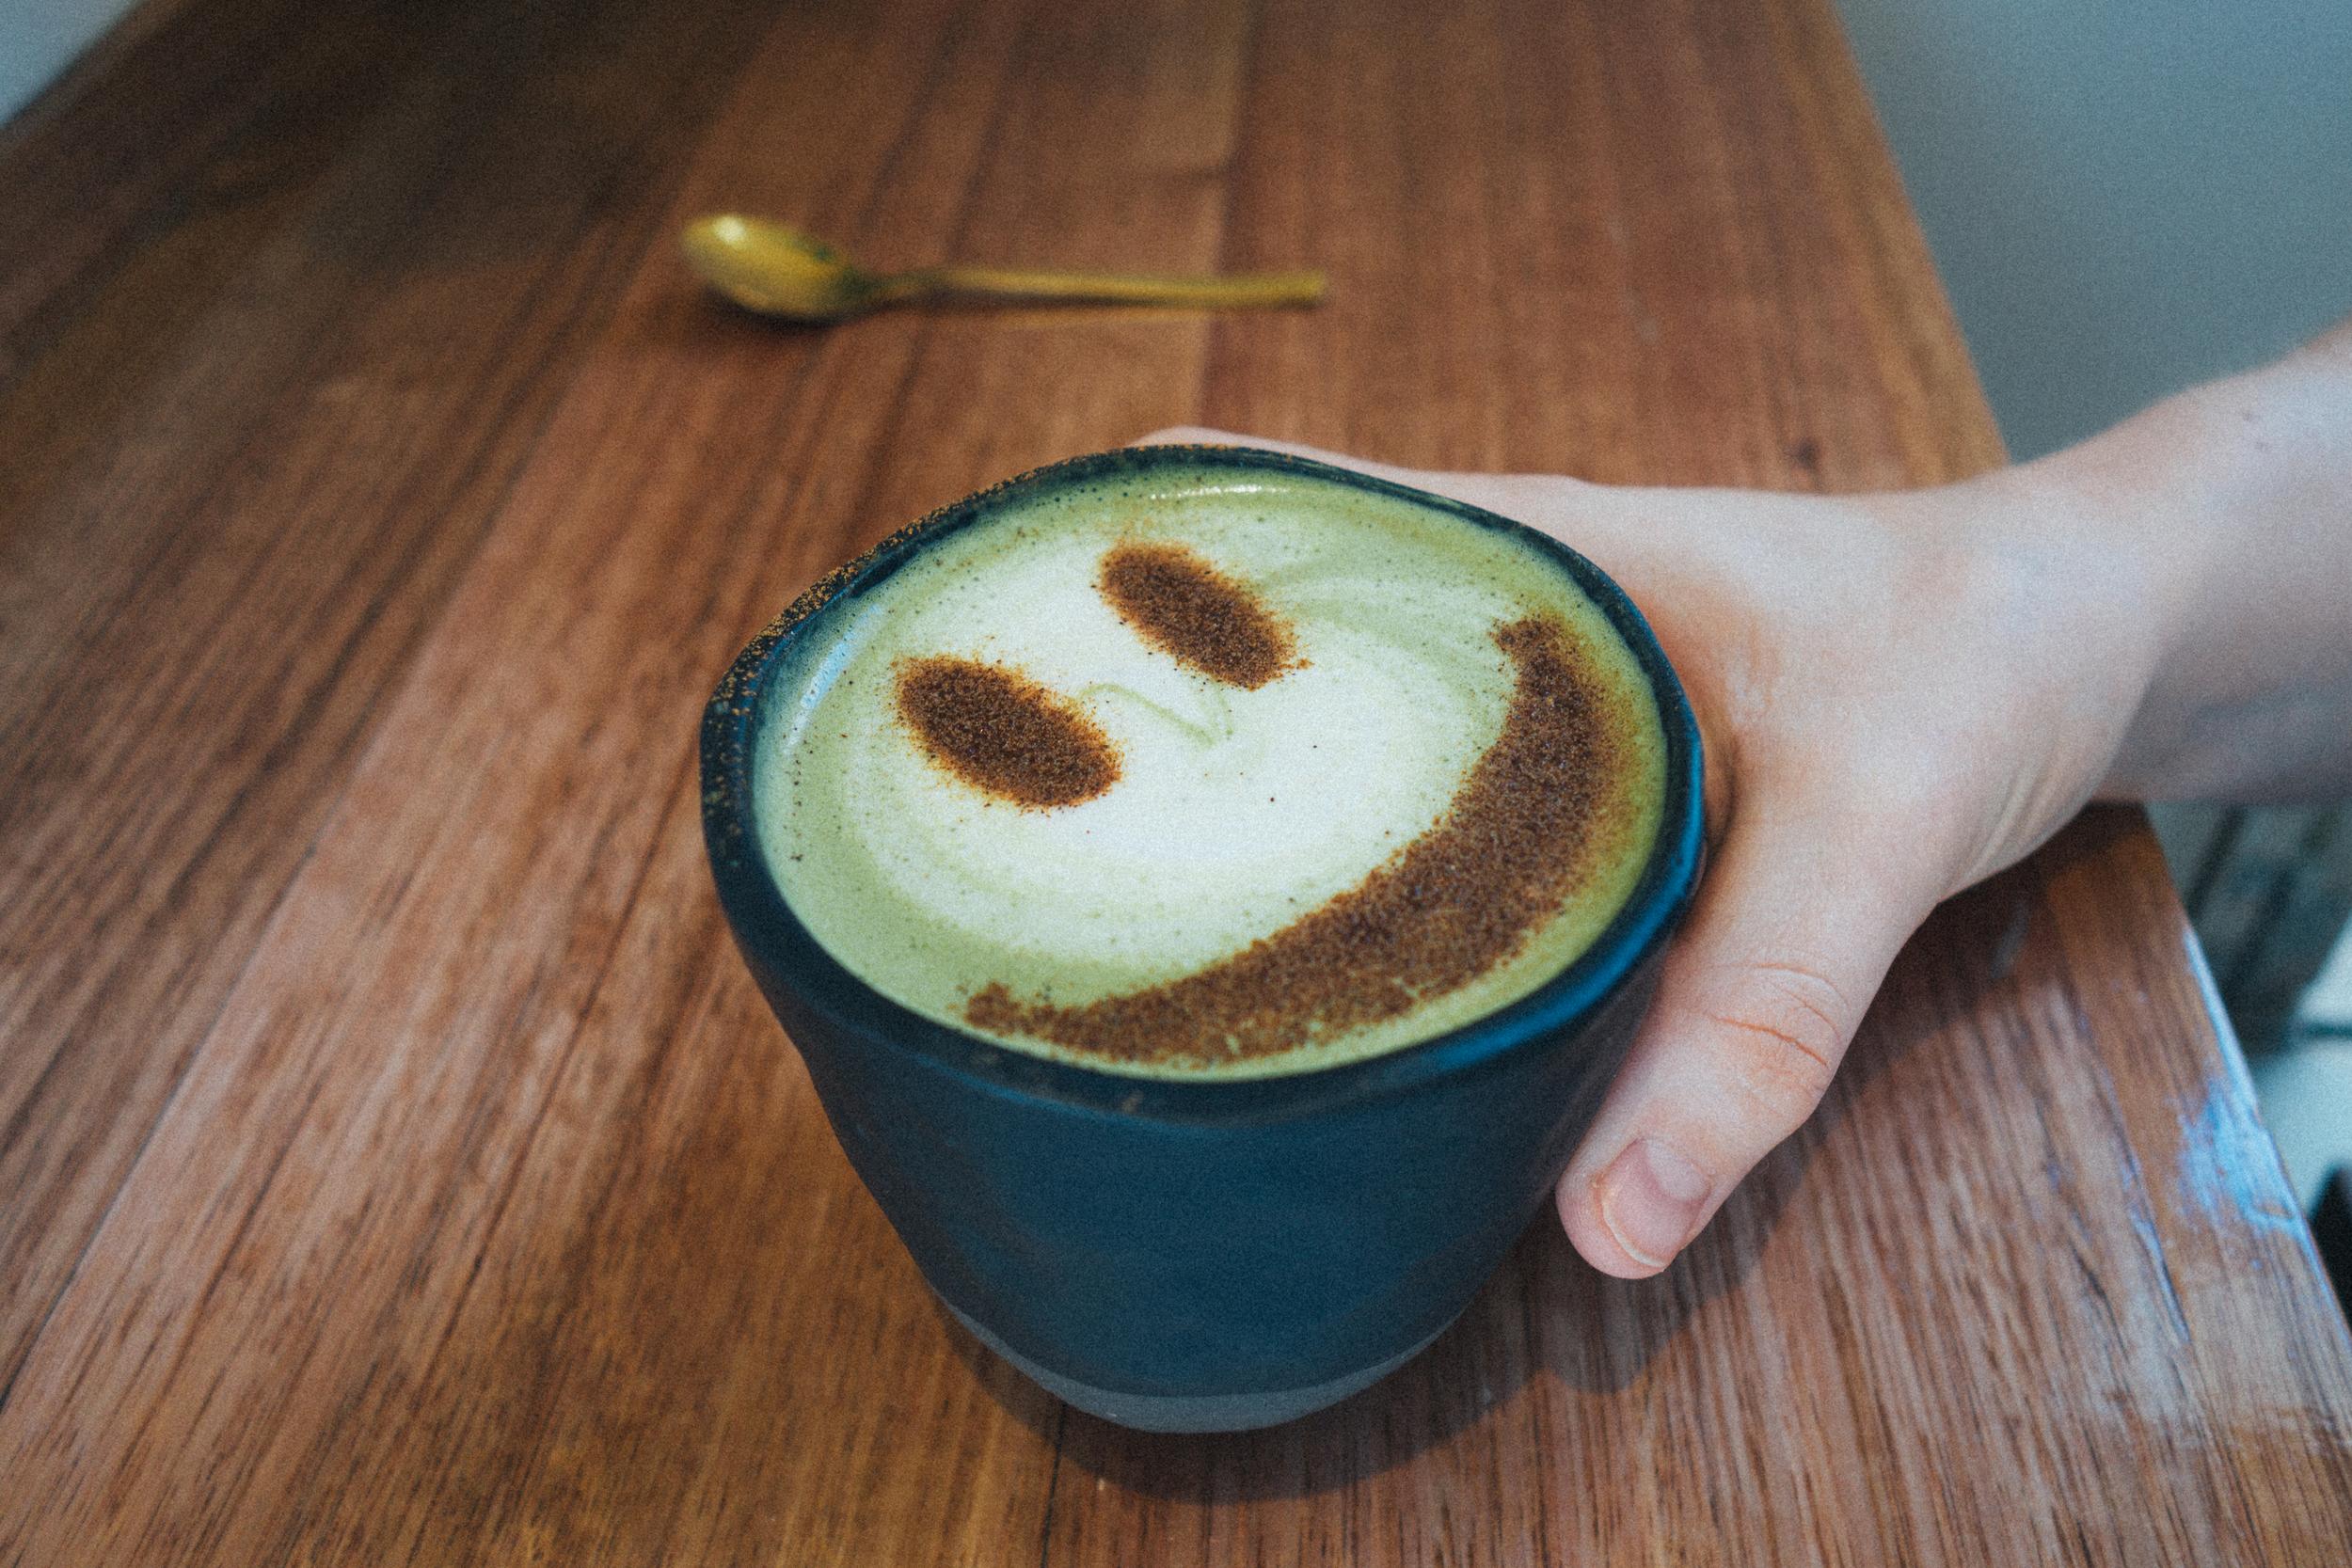 serotonin eatery matcha latte